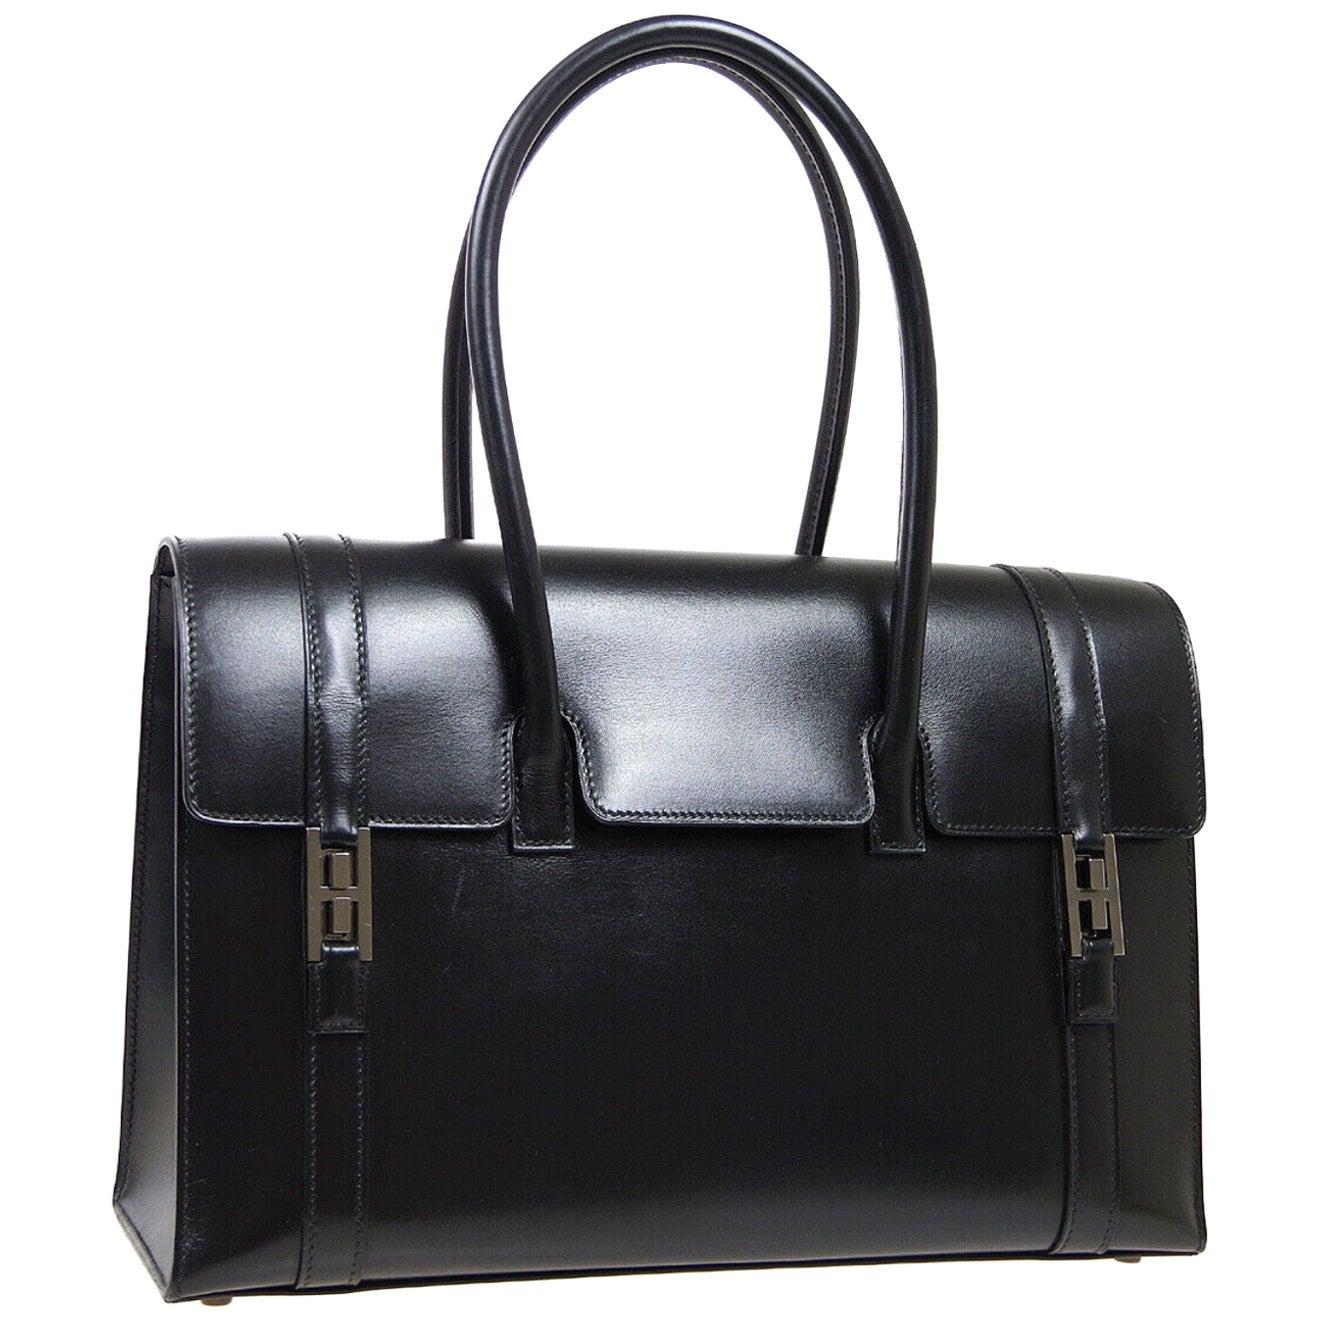 Hermes Black Leather Palladium Saddle Carryall Top Handle Satchel Kelly Flap Bag